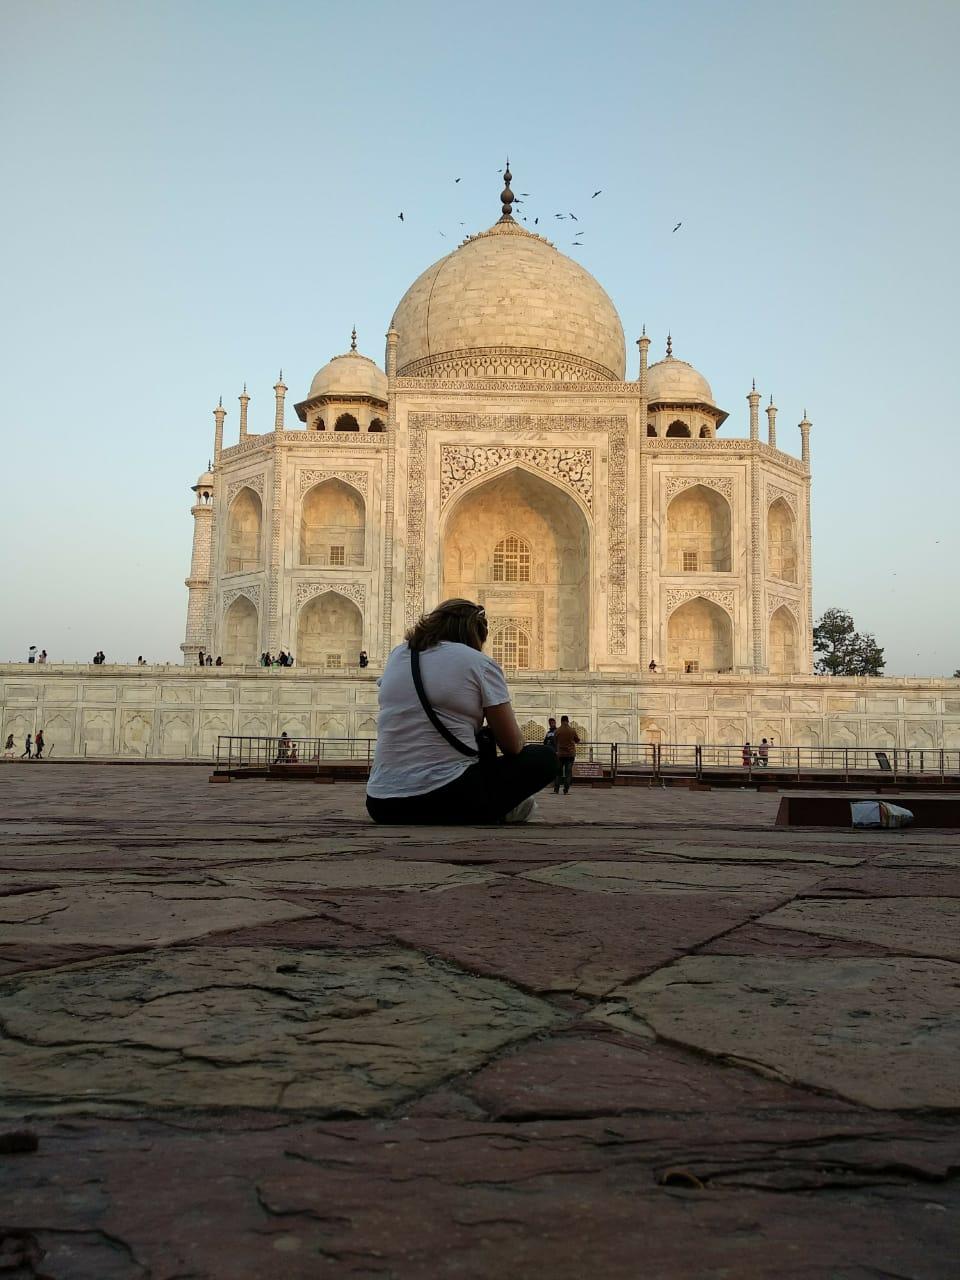 Admire the Taj Mahal